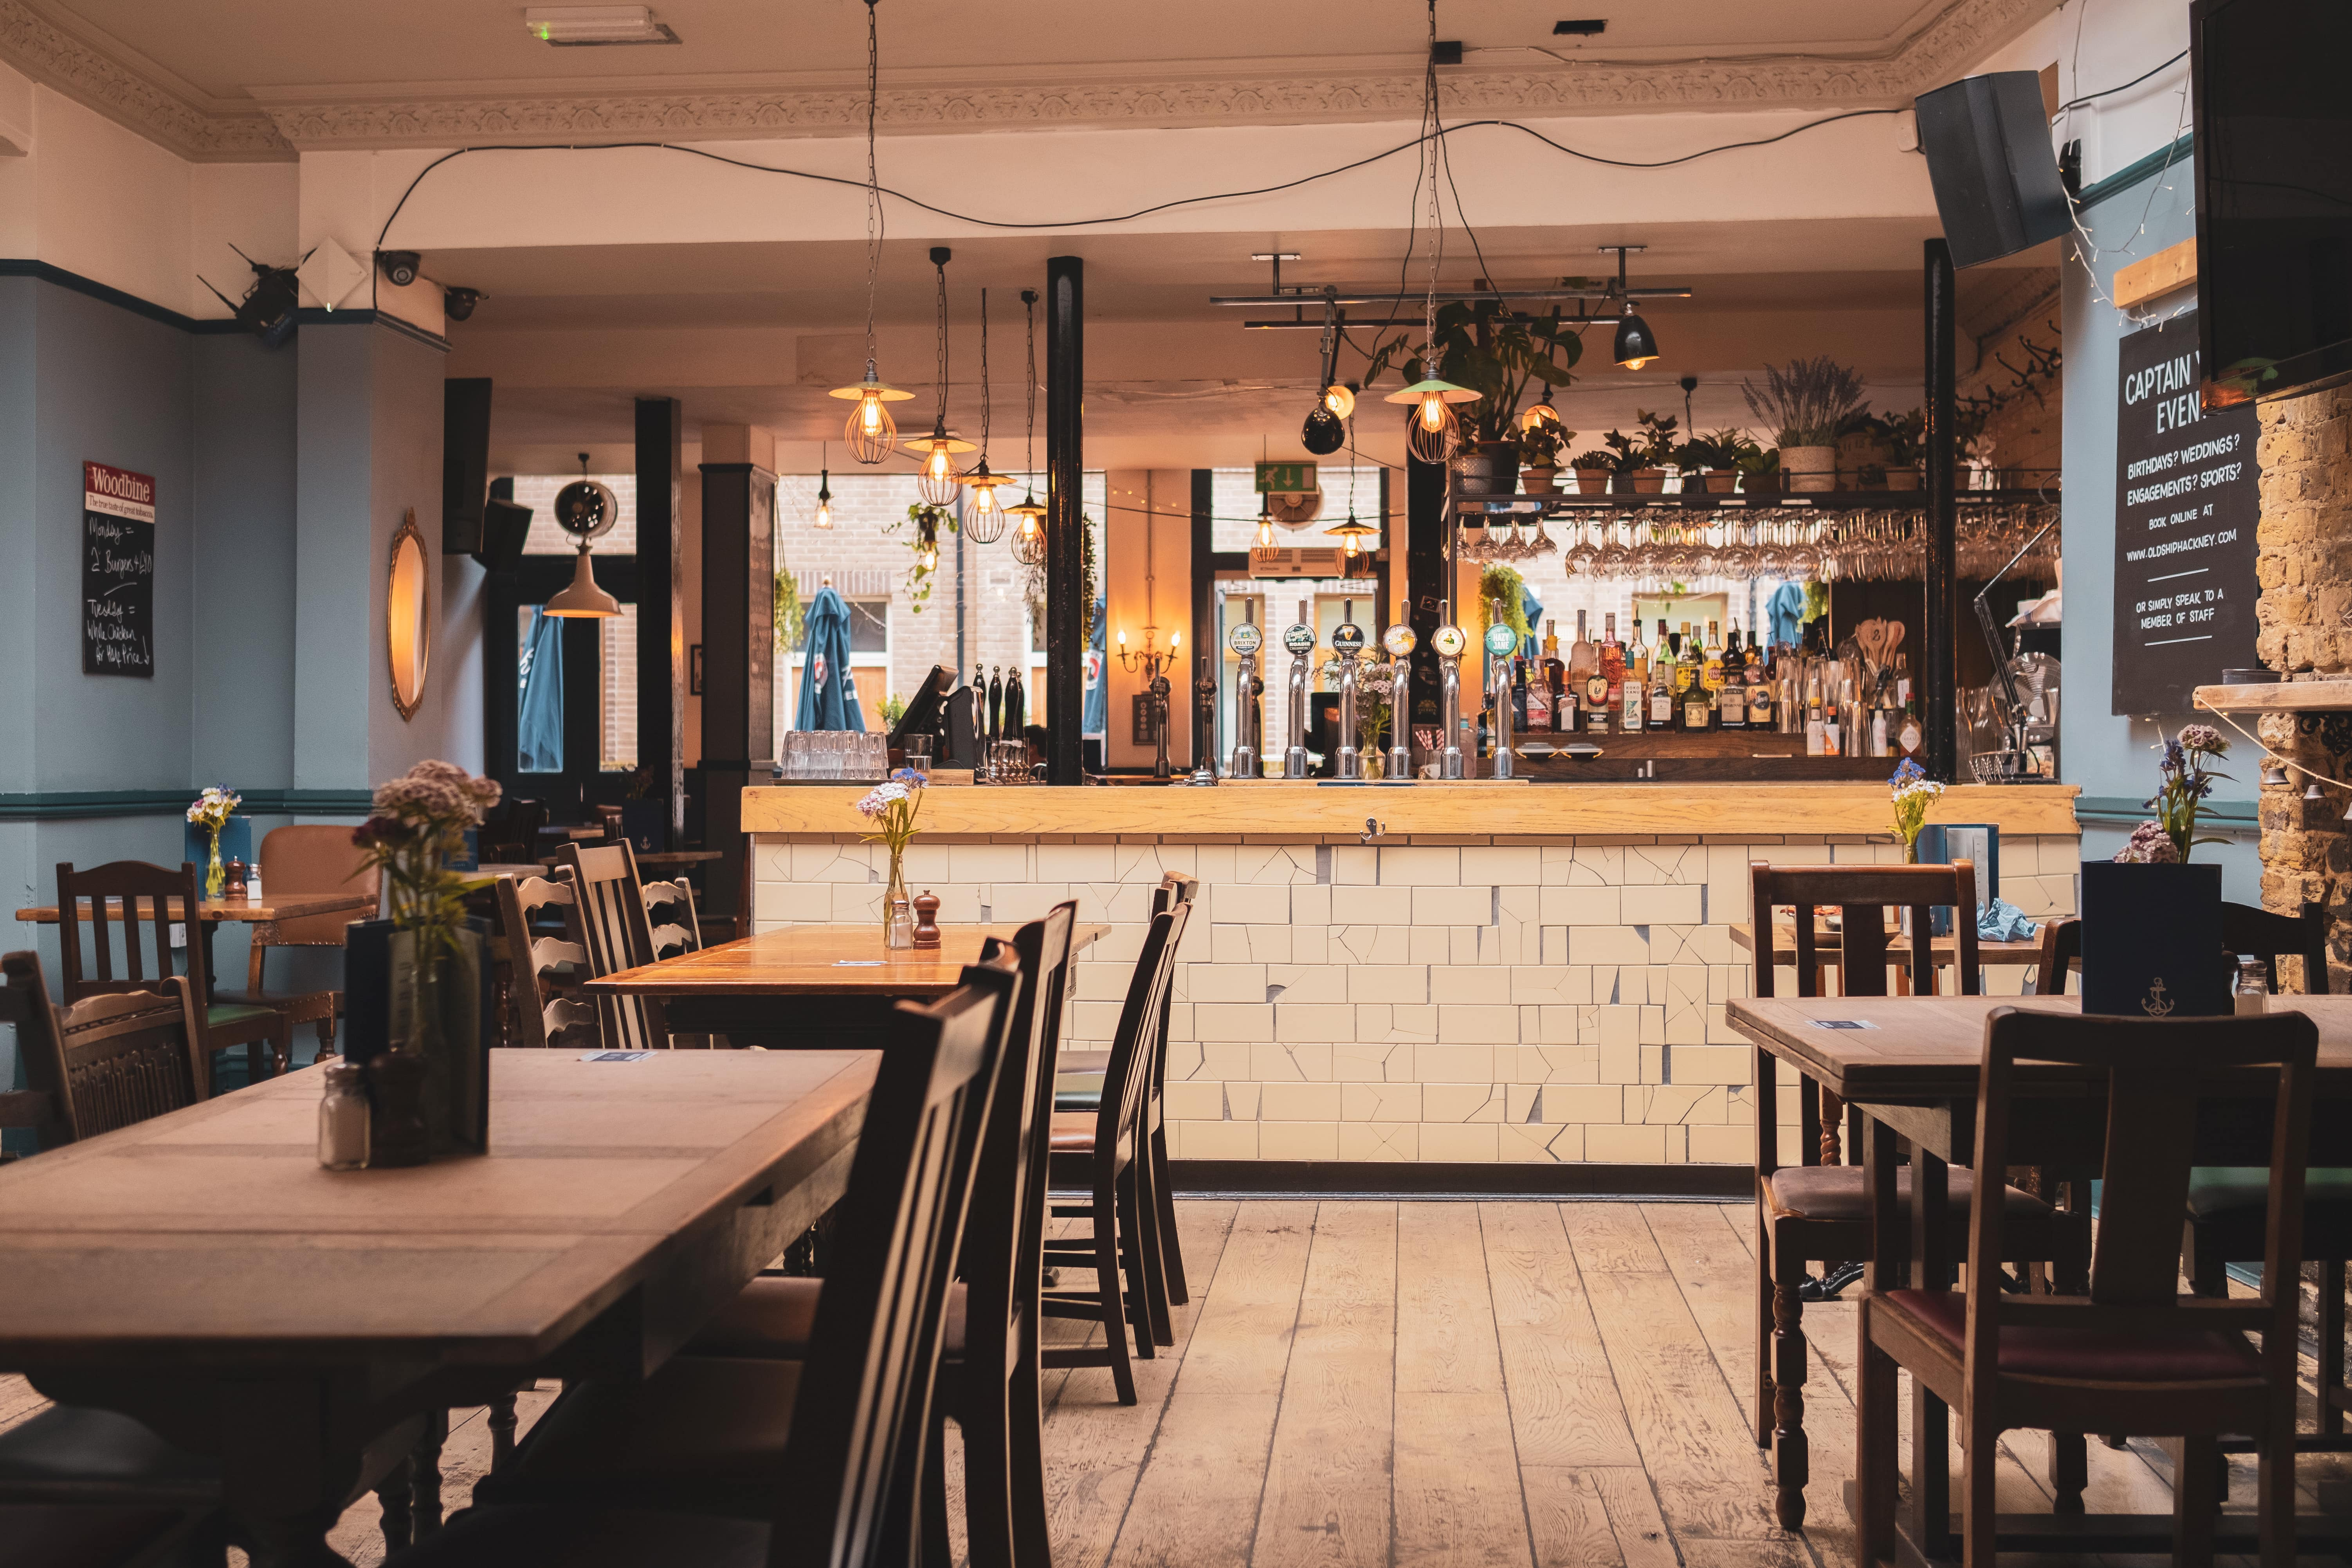 Hackney pub image of the bar